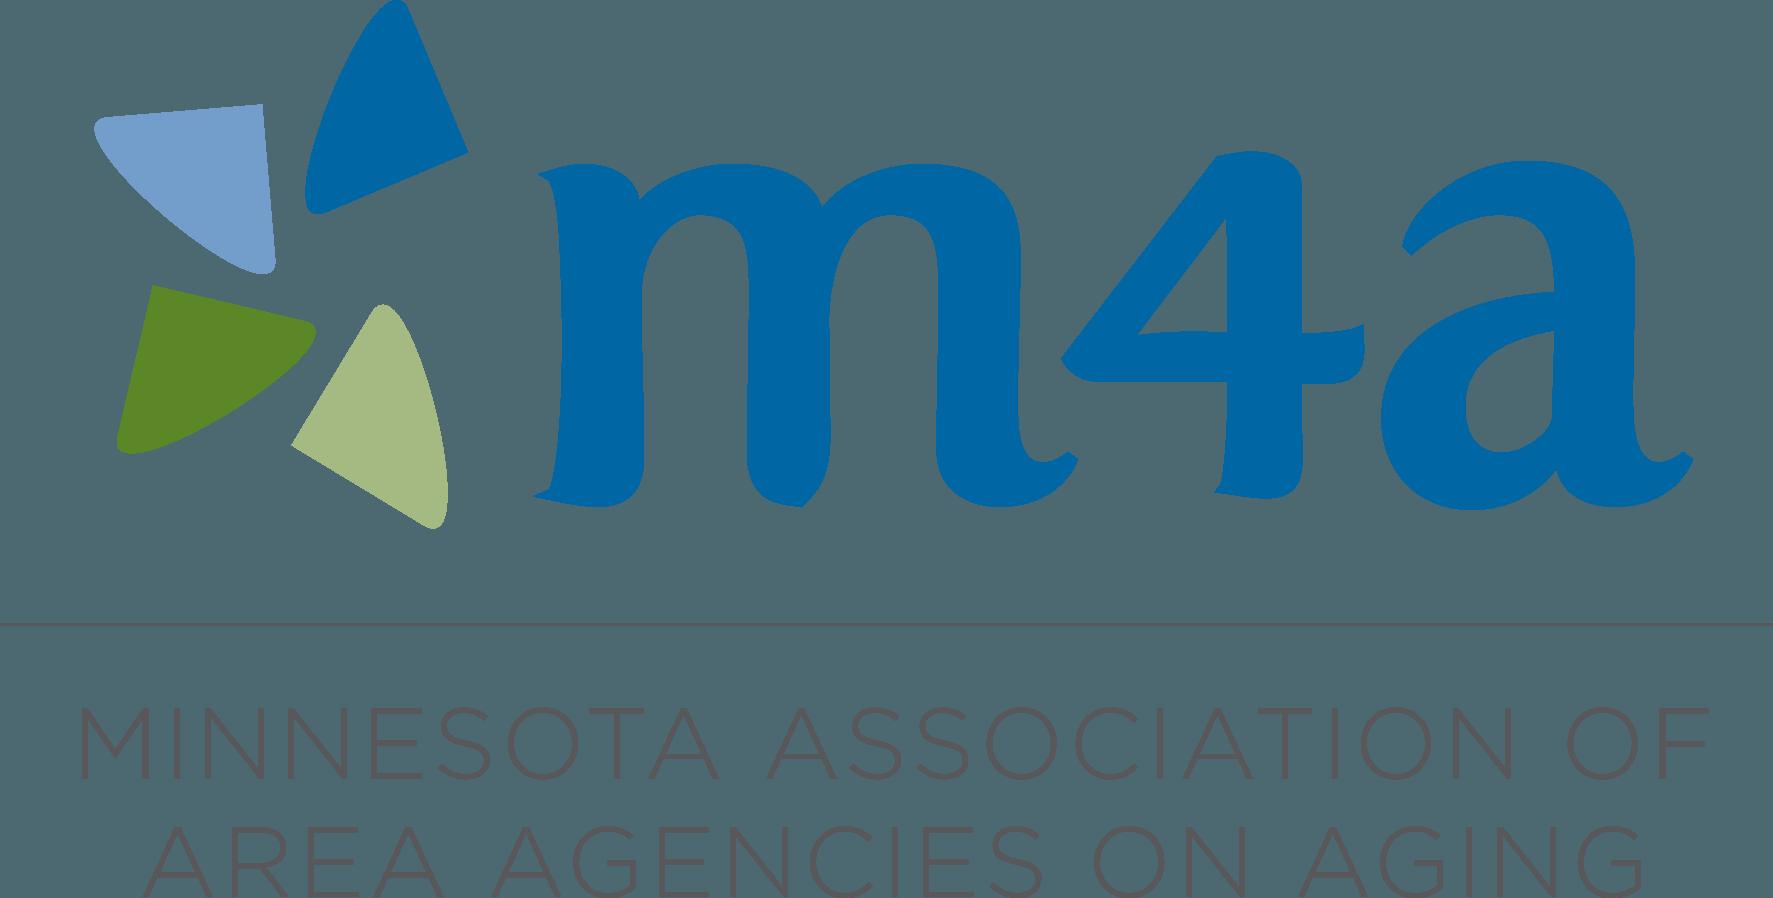 Minnesota Association of Area Agencies on Aging